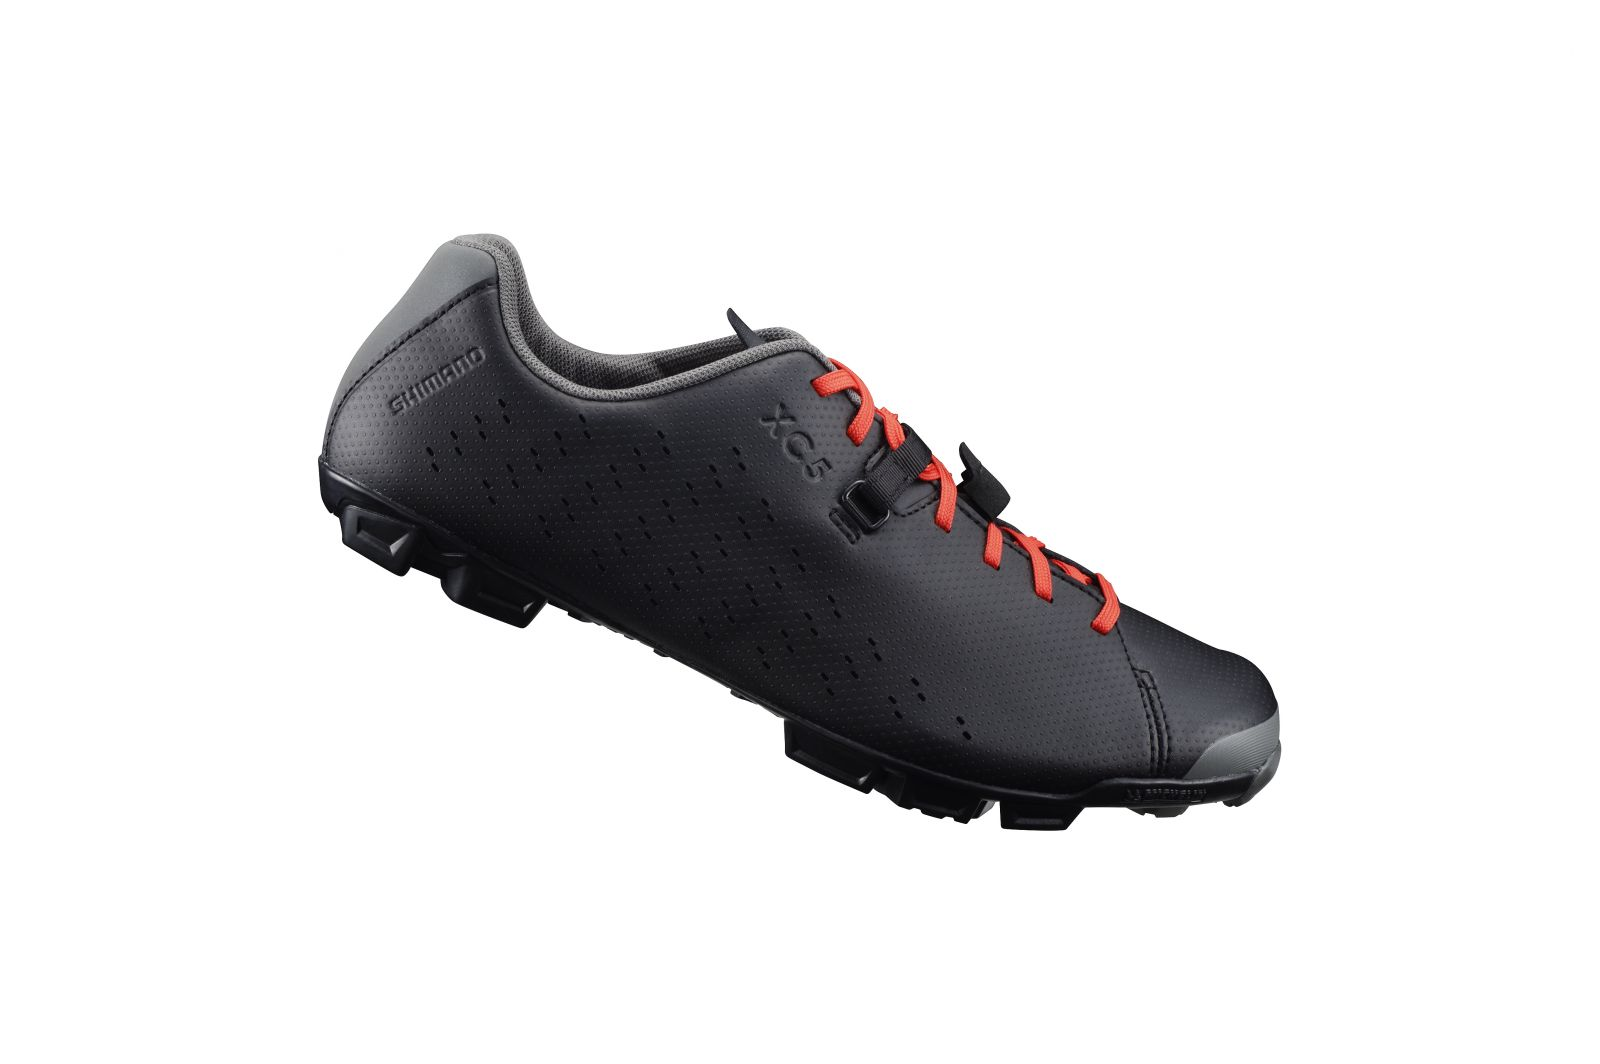 SHIMANO MTB obuv SH-XC500ML, černá, 42